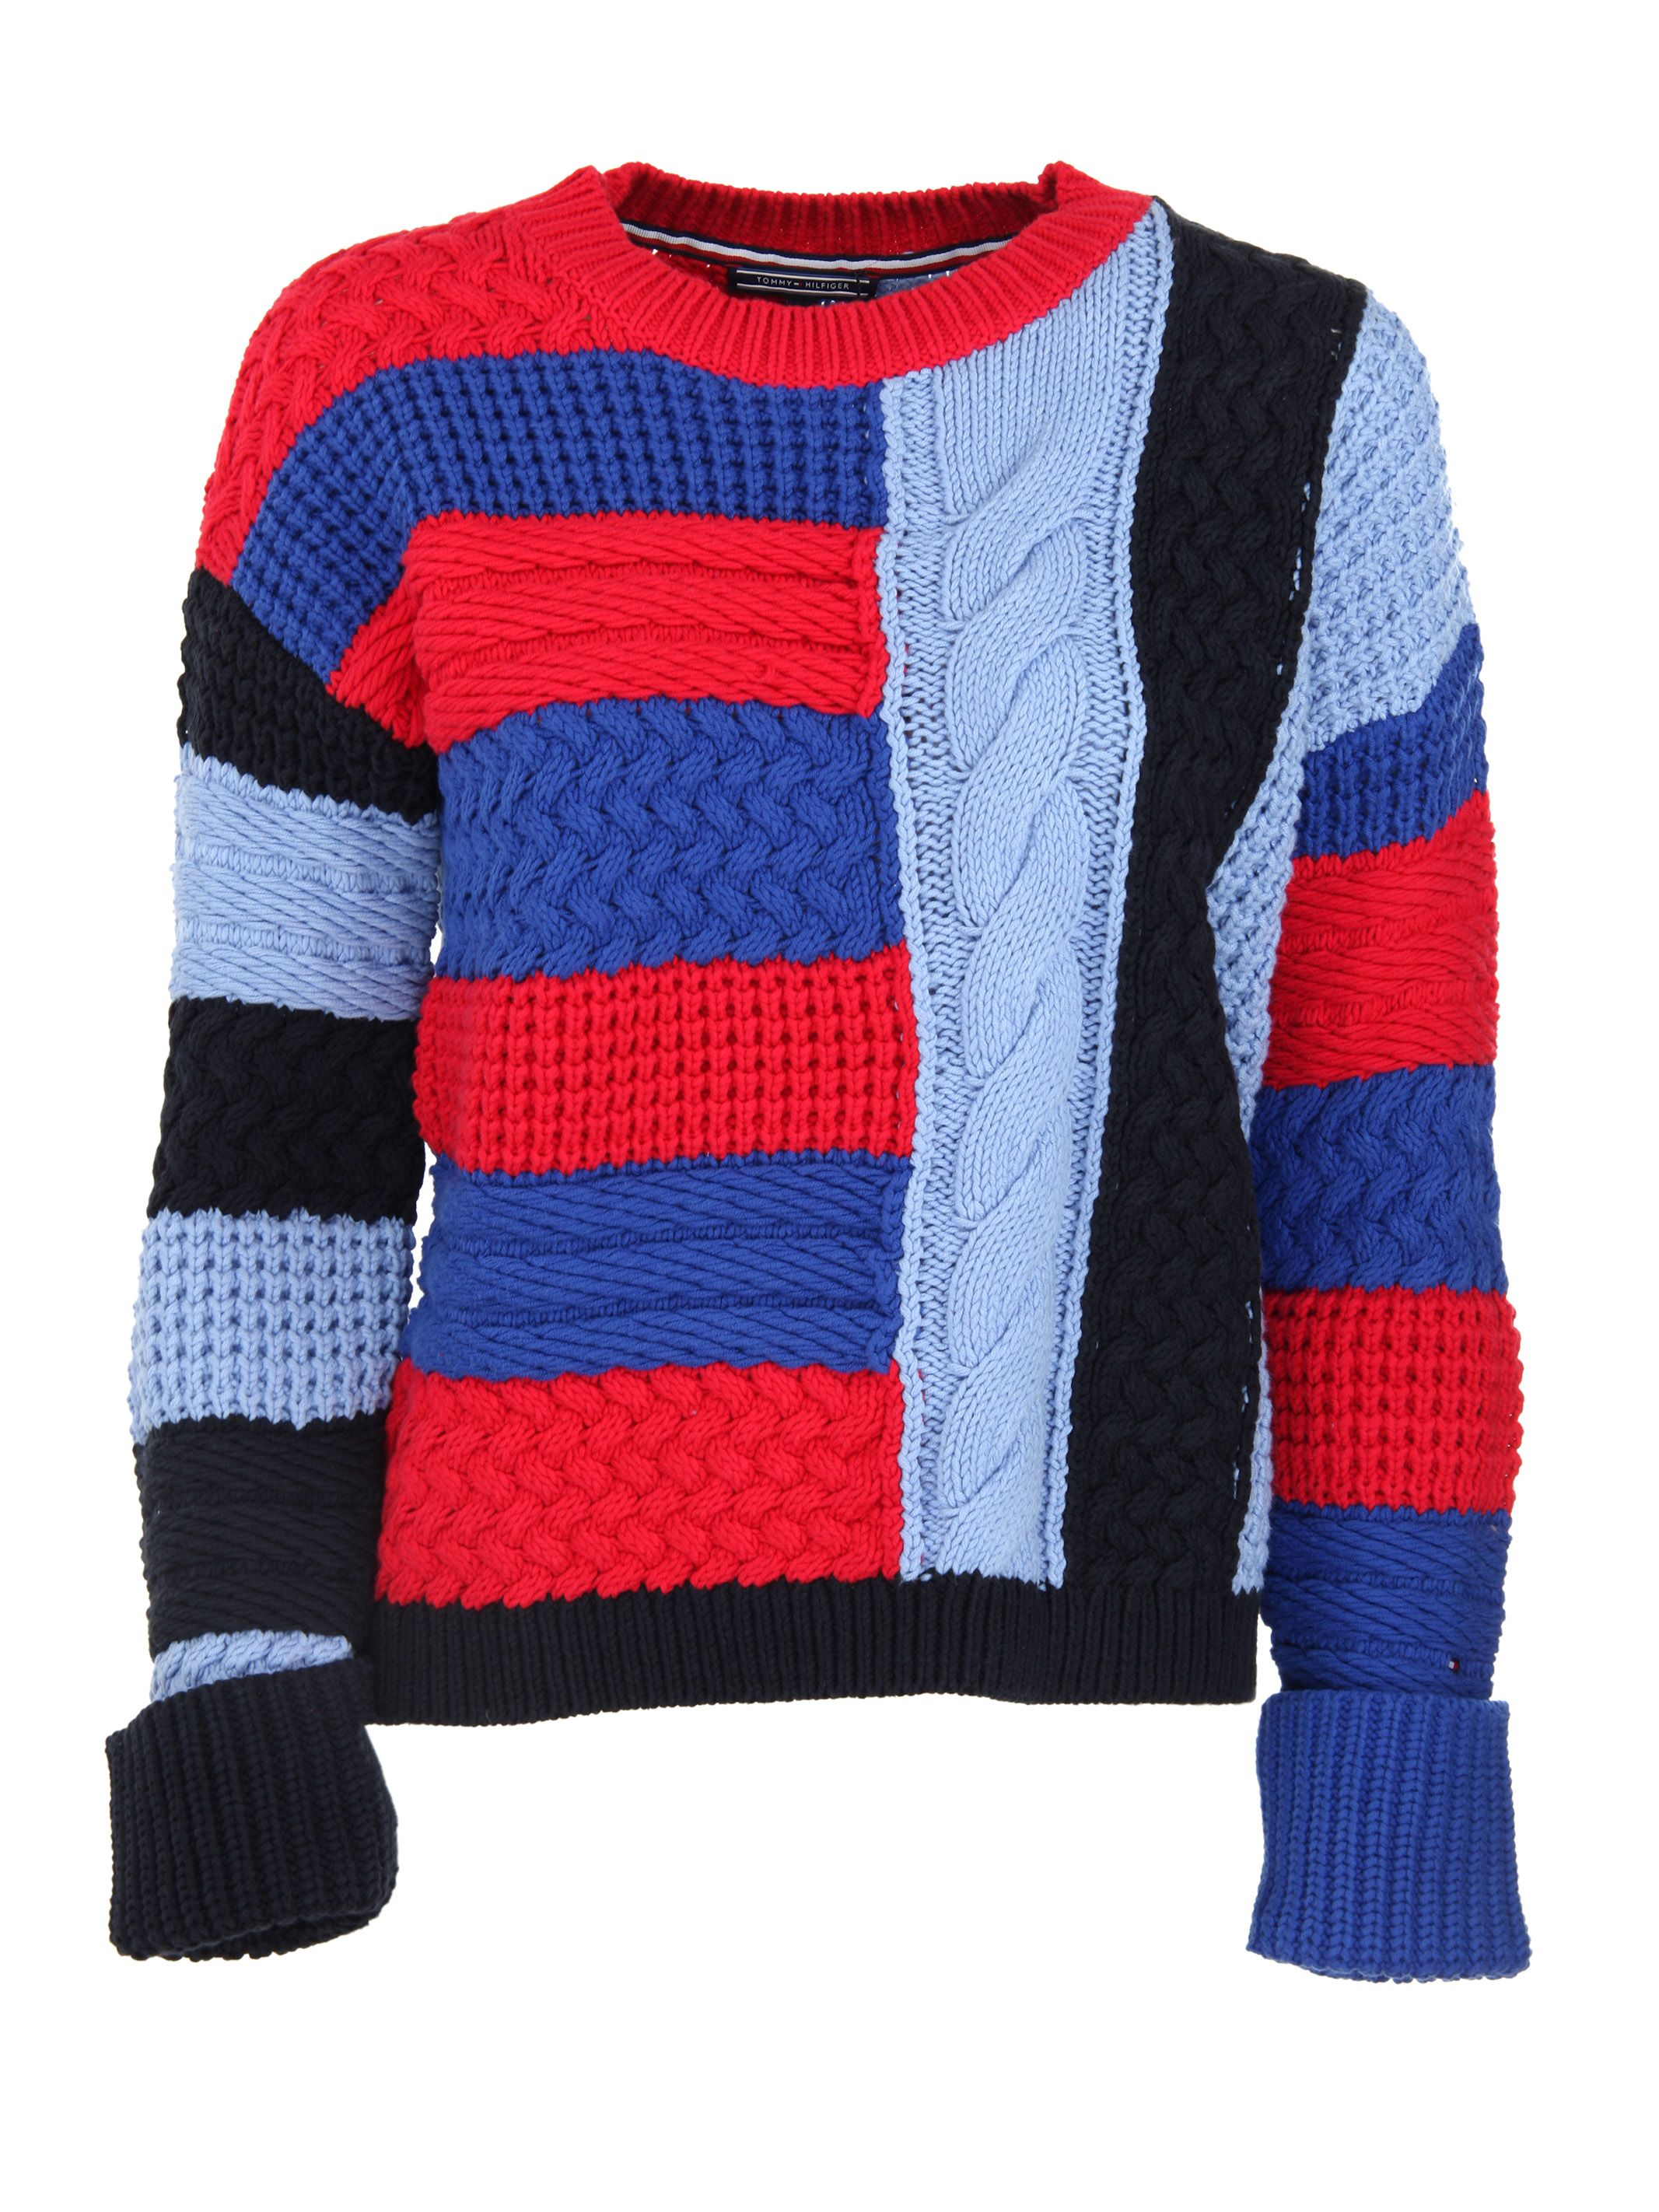 Tommy Hilfiger Contrast Knit Sweater